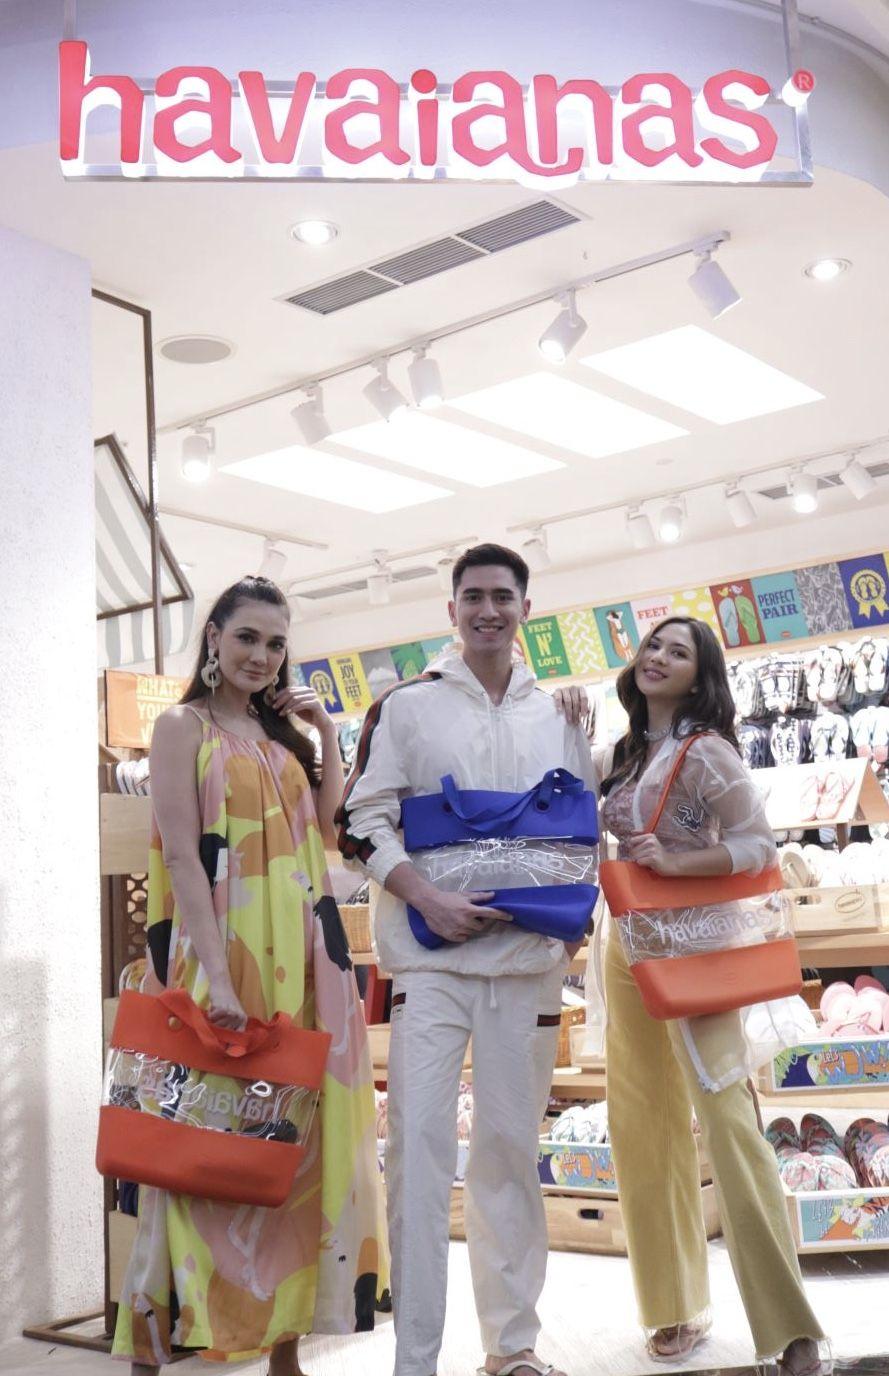 Havaianas presents their new faces Luna Maya, Verrell